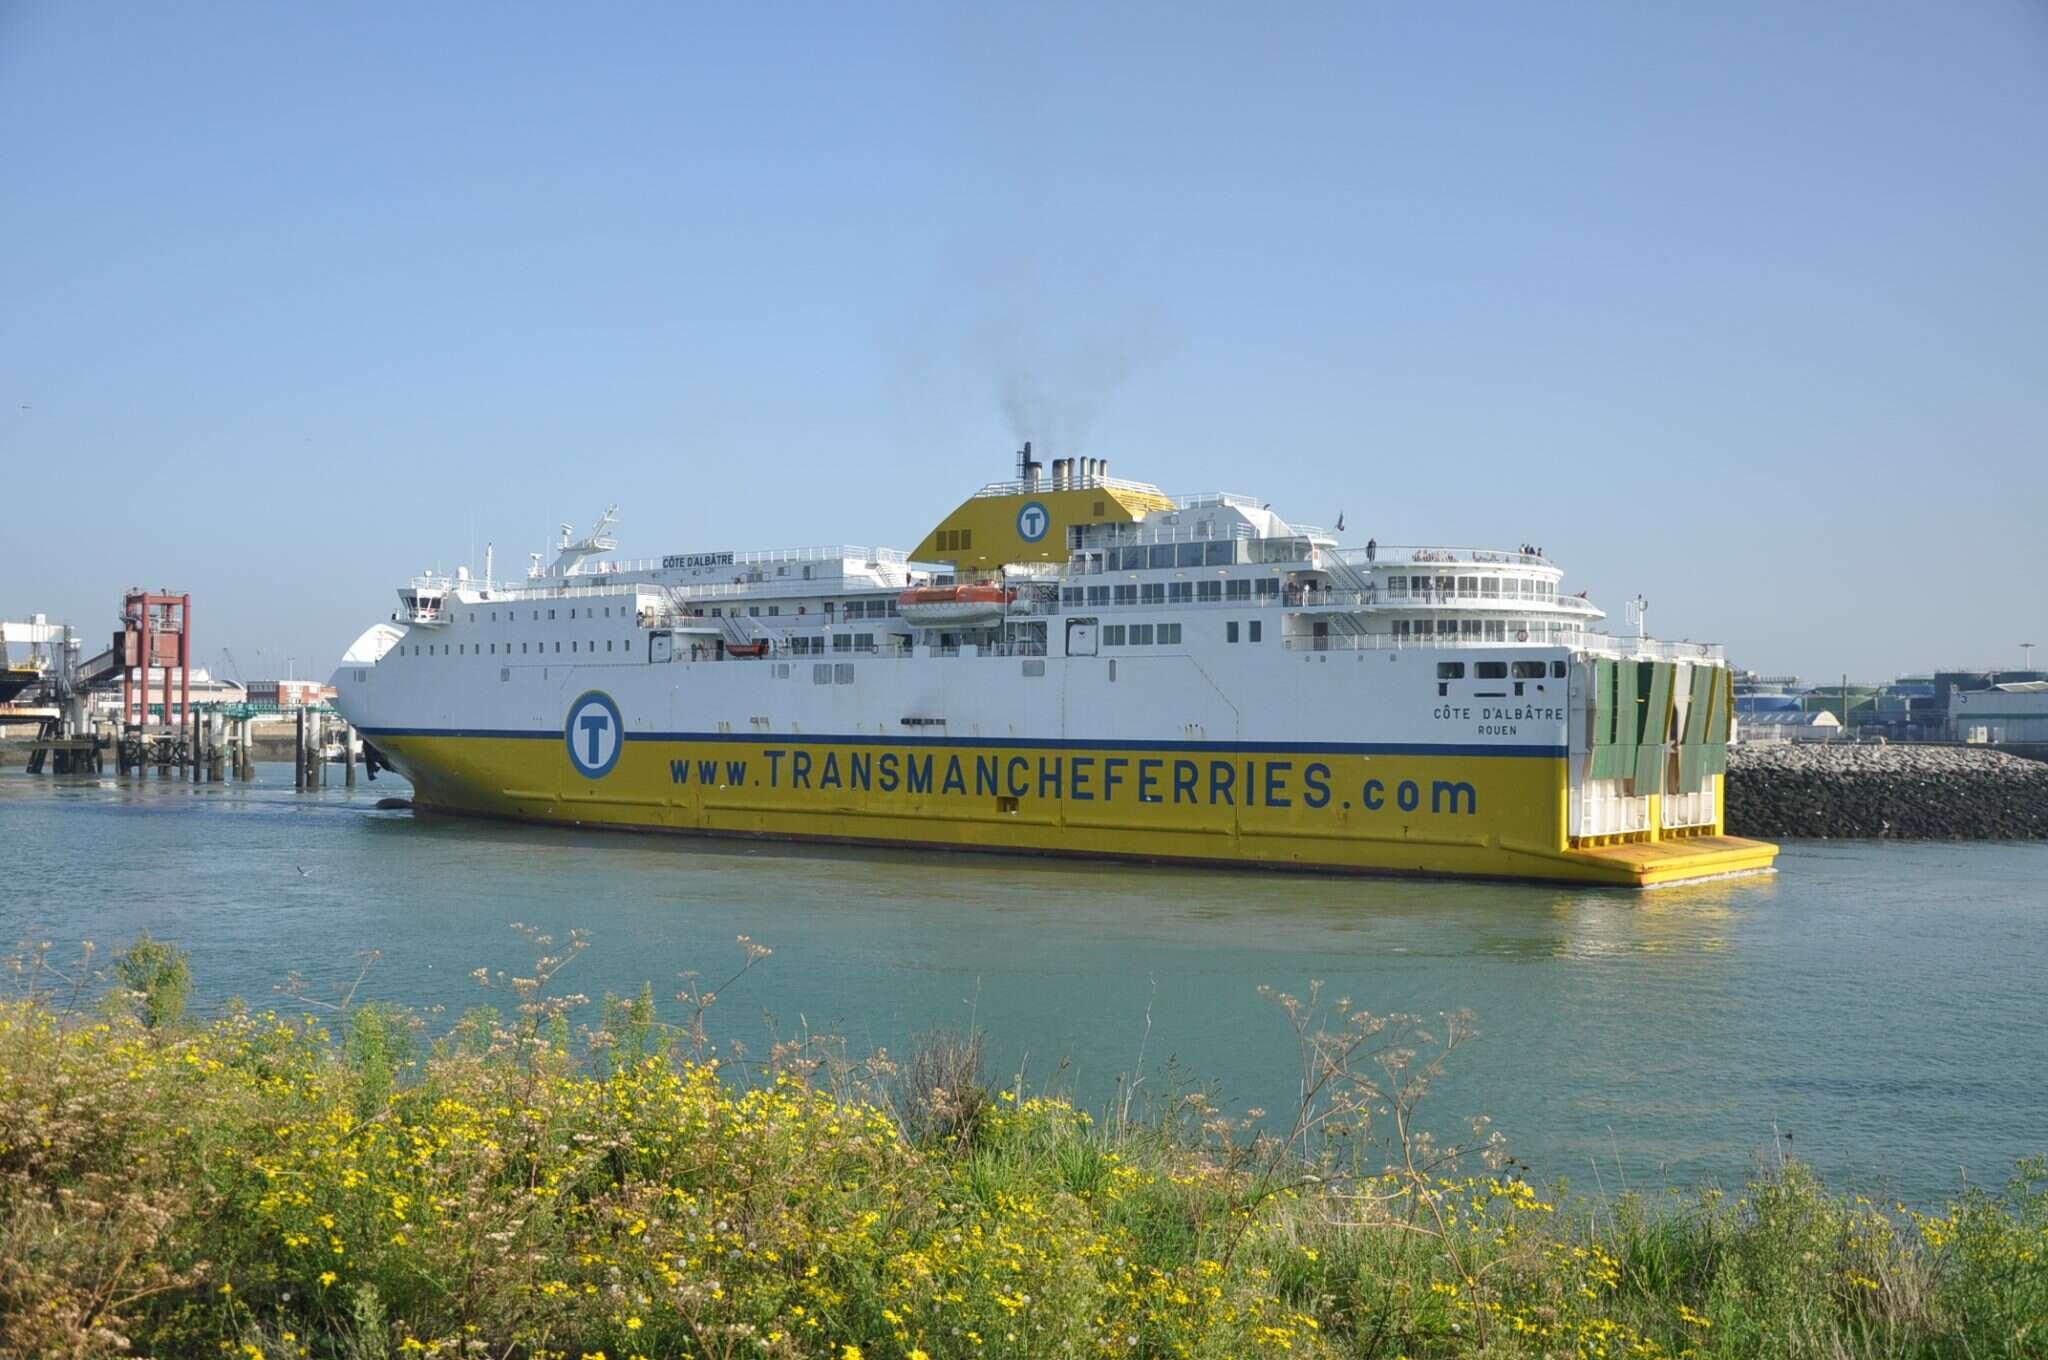 Transmanche-Ferries-3week itinerary london paris italy